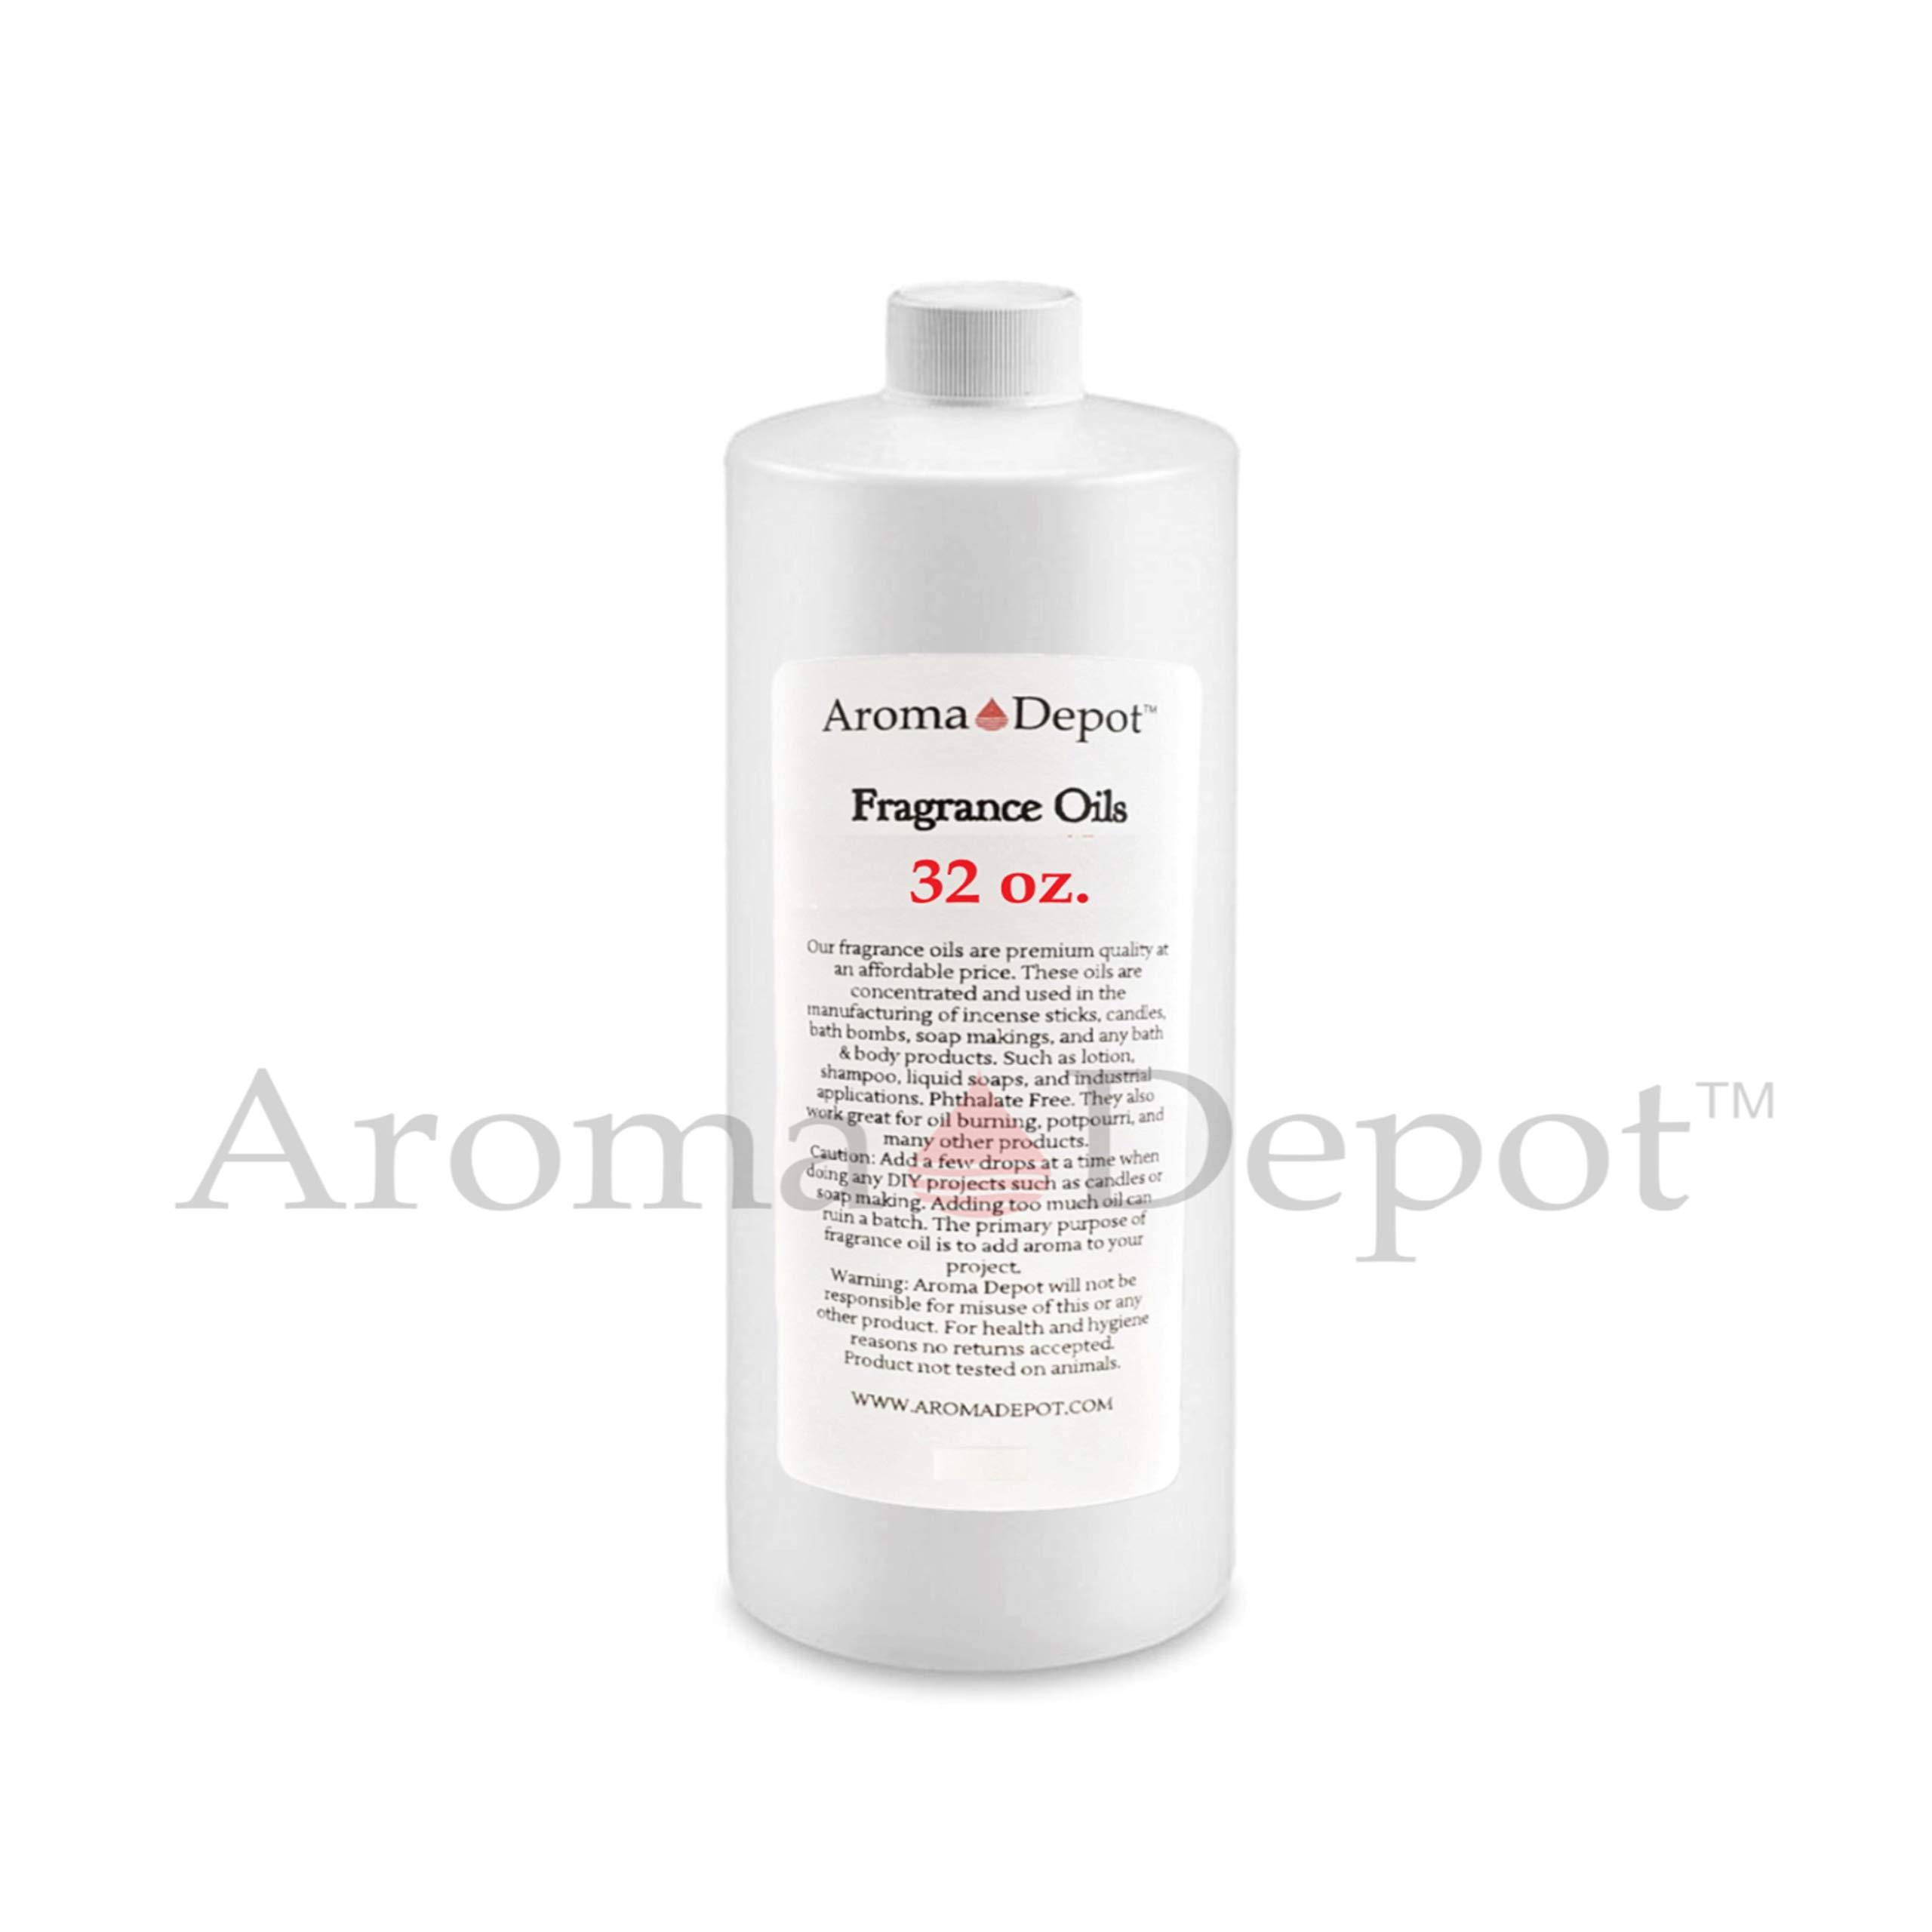 Peach Type Perfume/Body Oil (7 Sizes) Our Interpretation, Premium Quality Uncut Fragrance Oil (32 Ounce Plastic Bottle (960ml)) by Aroma Depot